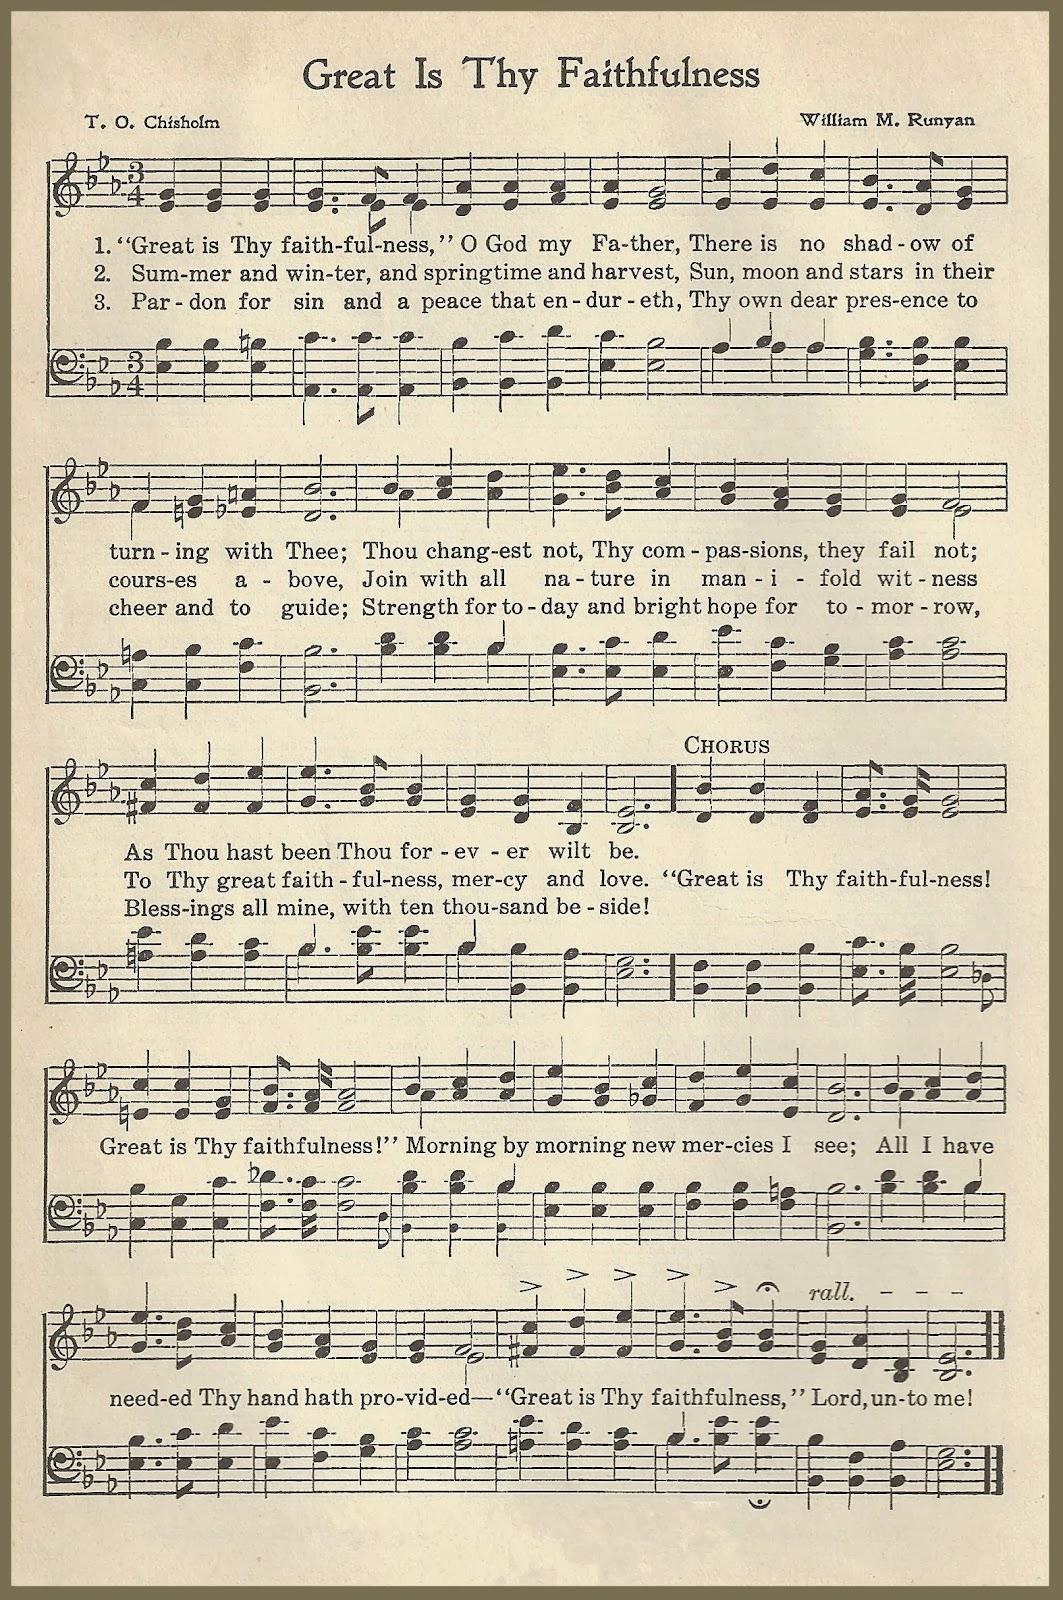 Songs Of Praises Great Is Thy Faithfulness